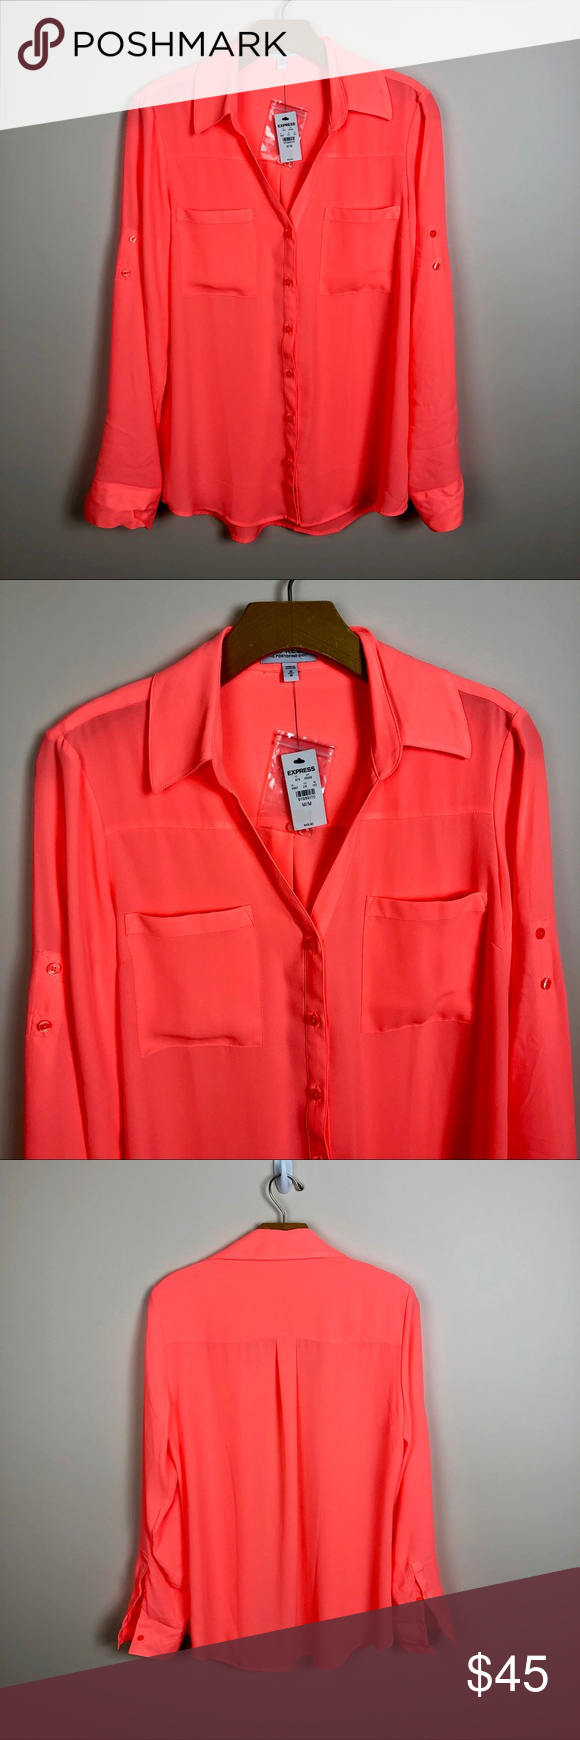 7c3e42c1a21a NWT Express Hot Neon Orange The Portofino Shirt NWT Express Hot Neon Orange  The Portofino Semi